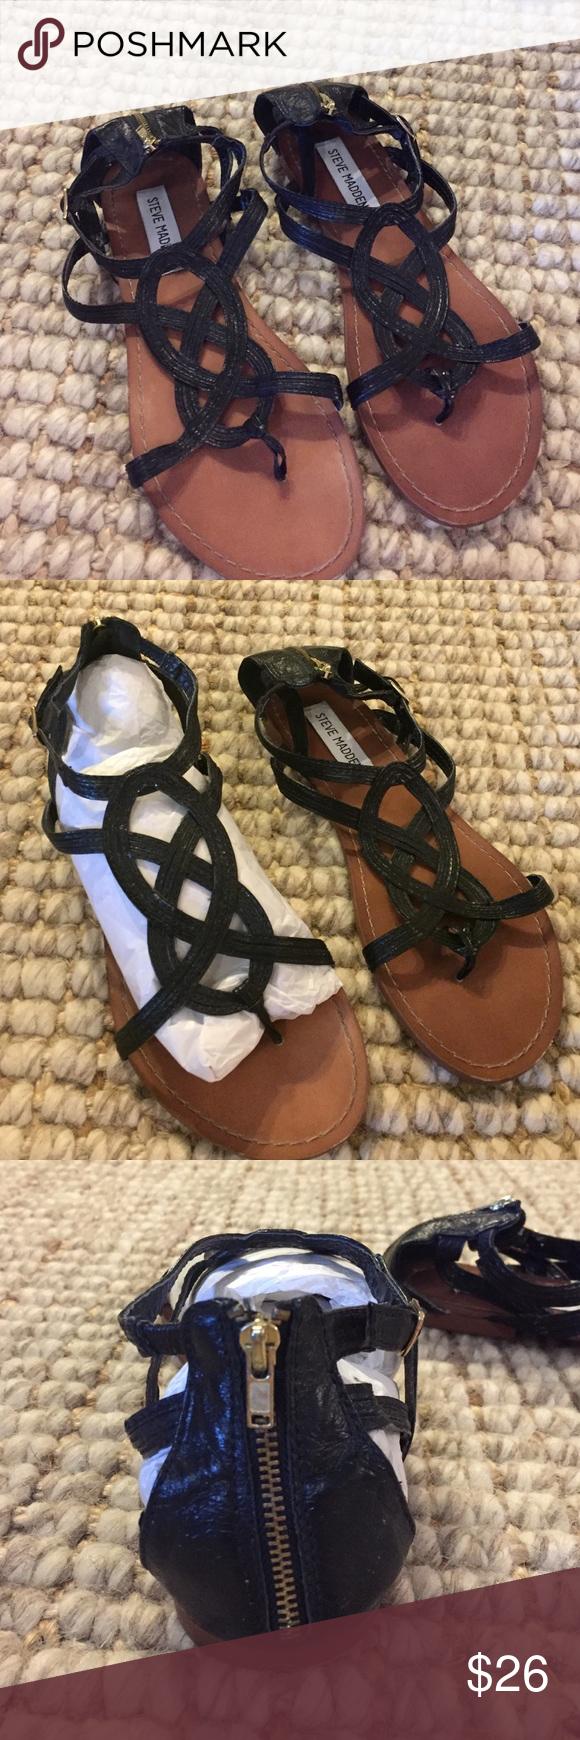 Steven Madden Sandals Steven Madden Black LEATHER Sandals, Size: 8 1/2M, Excellent Condition Steve Madden Shoes Sandals